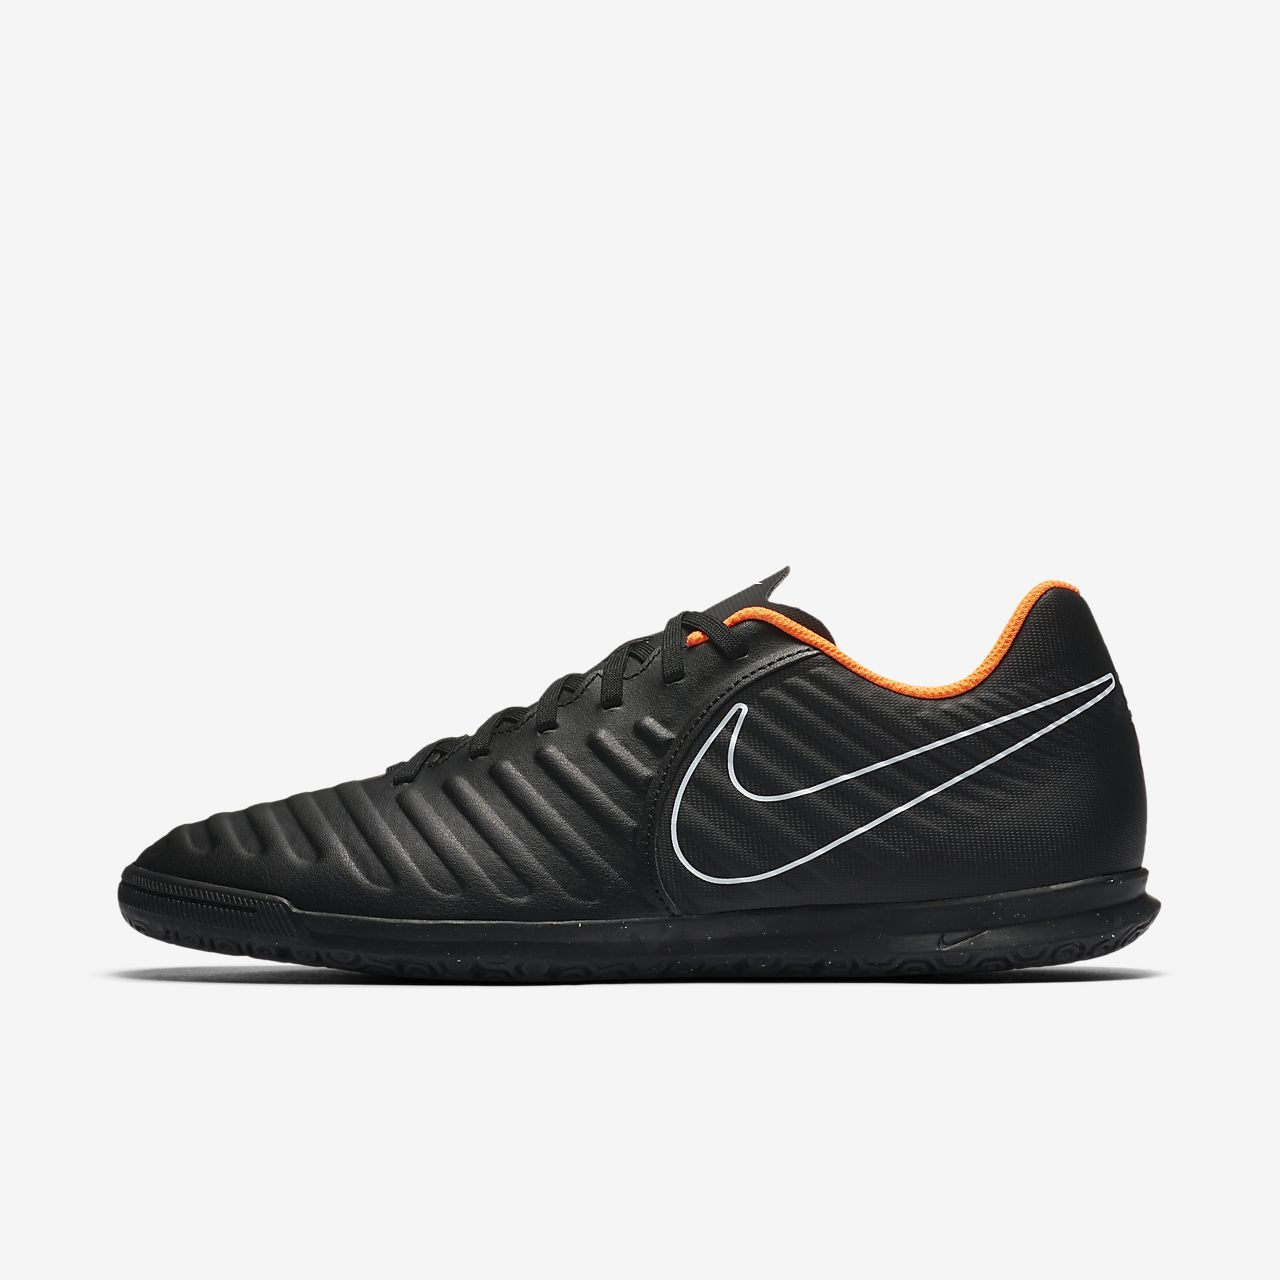 ... Nike TiempoX Legend VII Club Indoor/Court Football Shoe